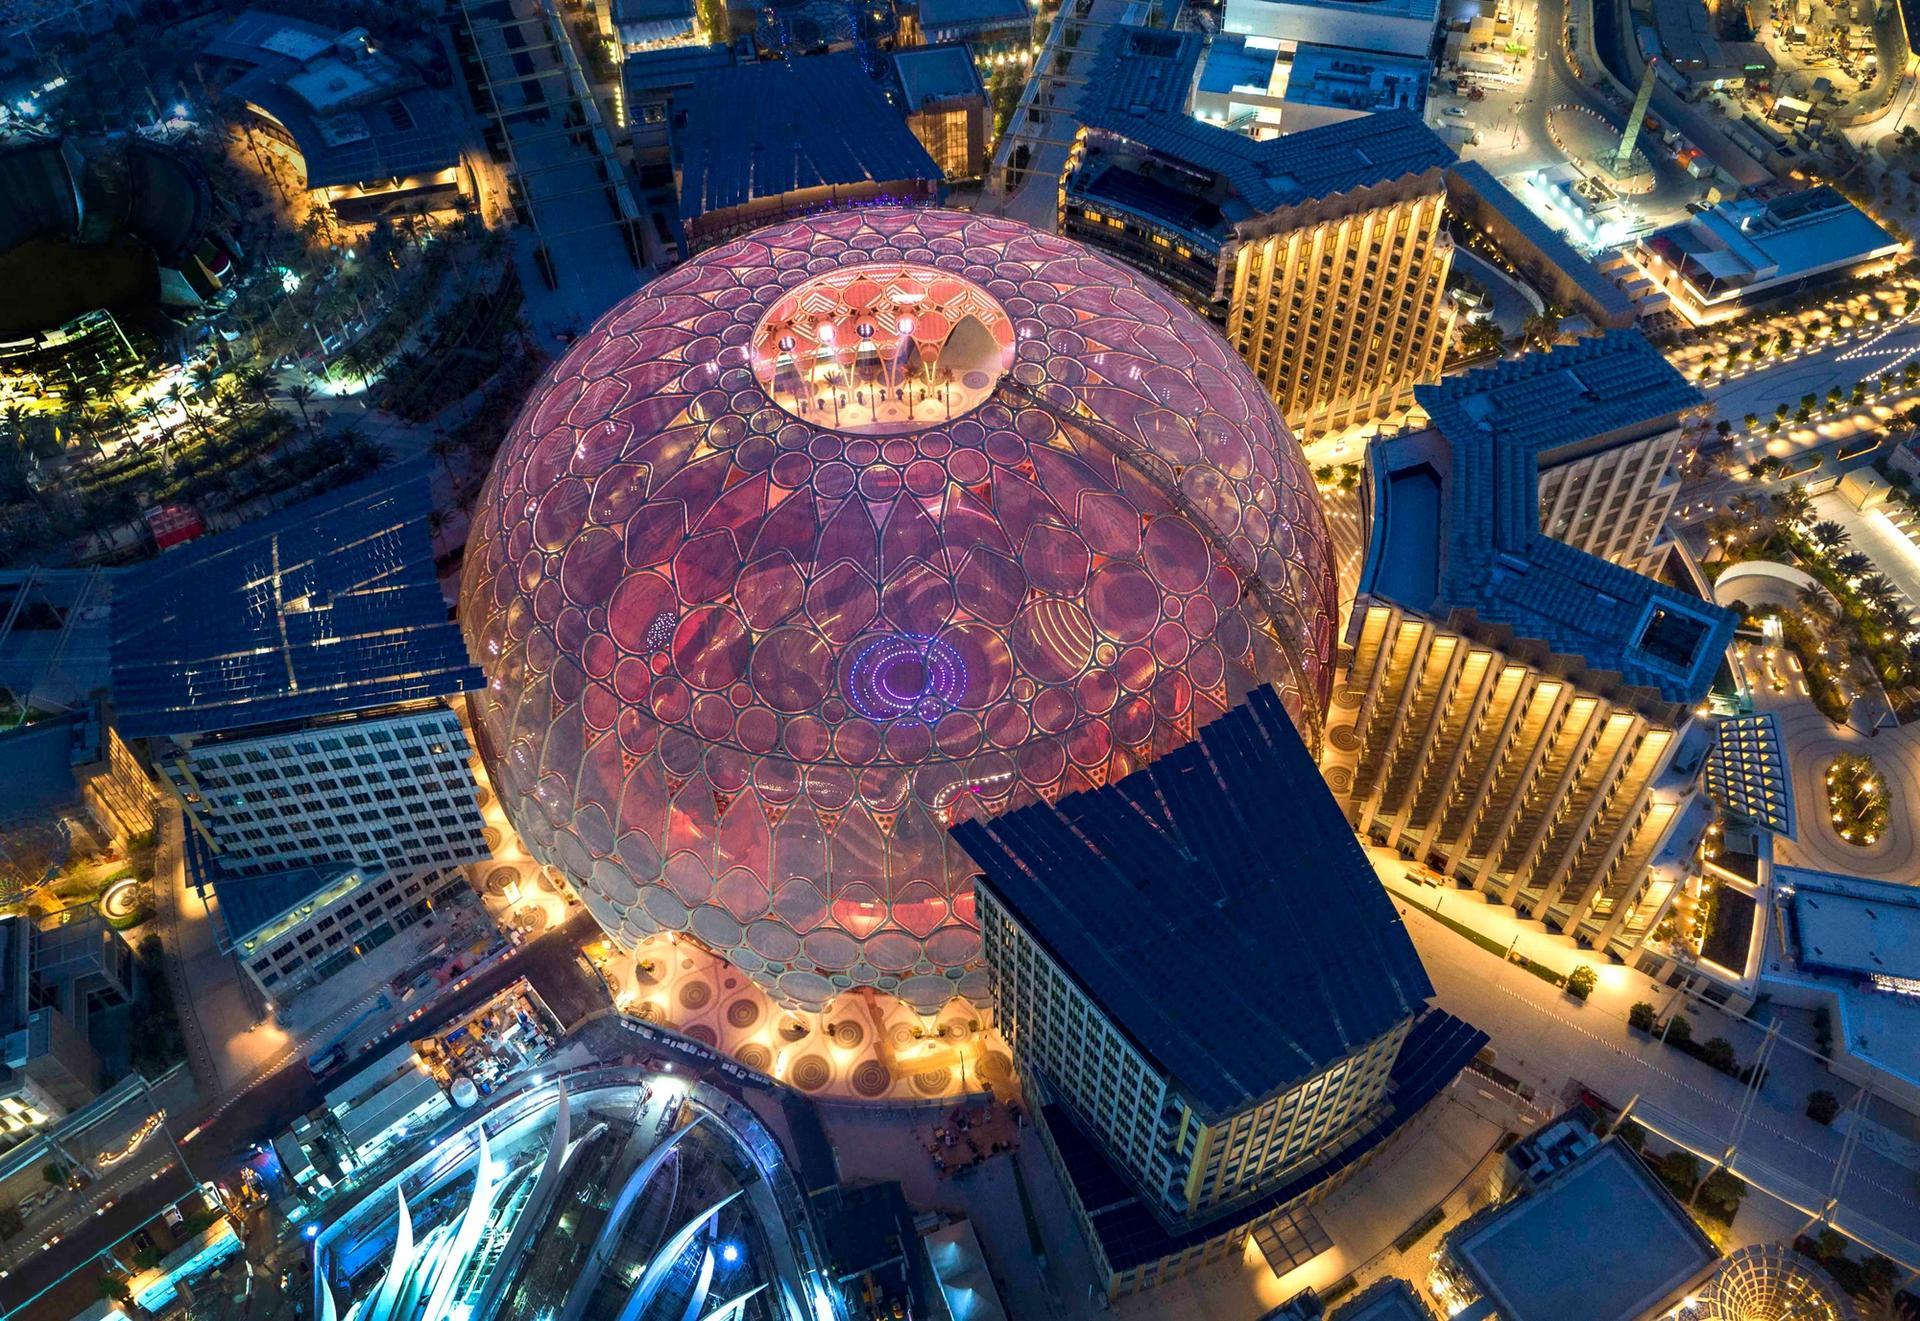 Aerial view of Al Wasl, Expo 2020 Dubai. Photo by Dany Eid/Expo 2020 Dubai